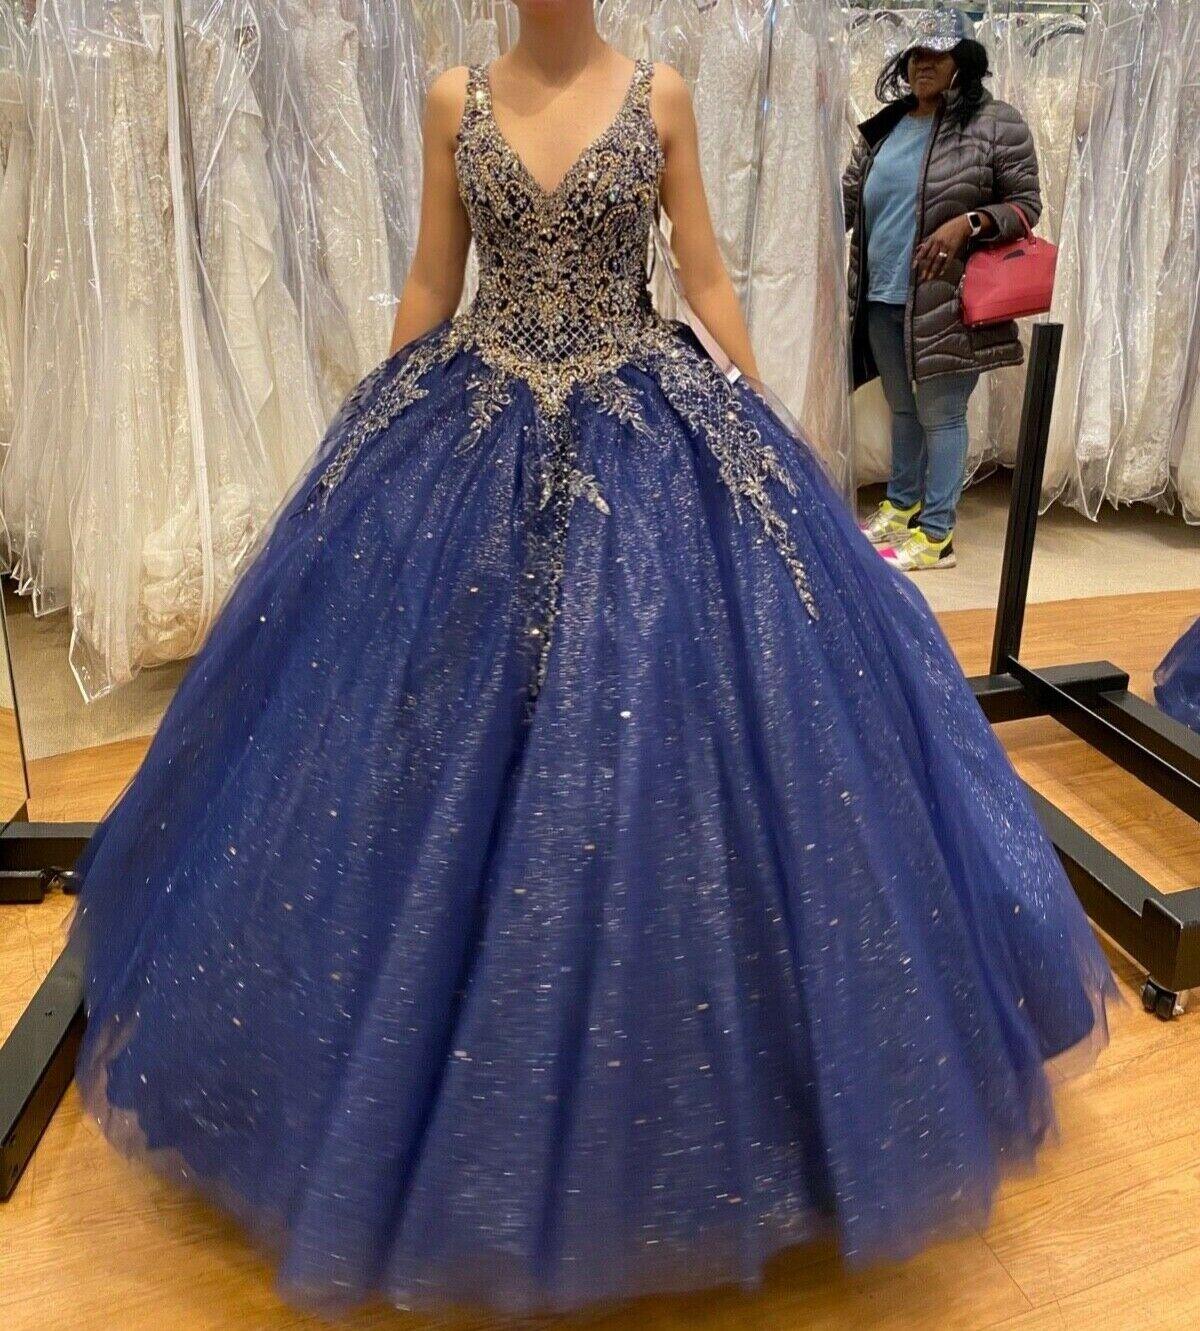 Sweet 16 dress, Crinoline (one size), Tiara, 3pc Jewels & Shoes sz8 all included